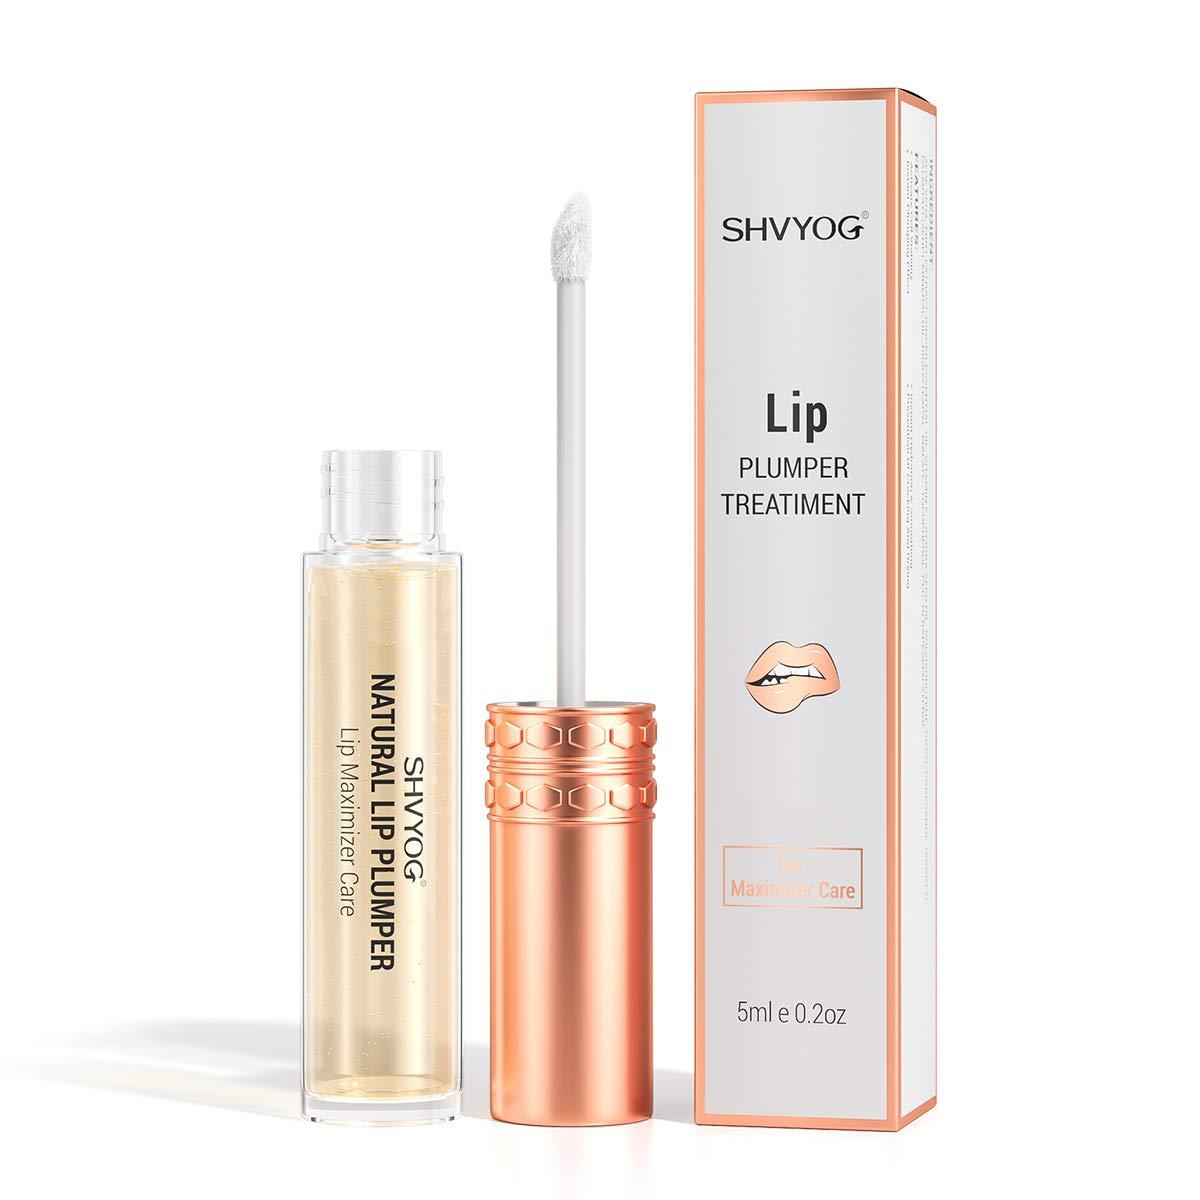 Natural Lip Plumper, Lip Enhancer Fuller Lip Plumping Balm Lip Care Serum Moisturizing & Hydrated Sexy Lips, Maximizer Lip Care